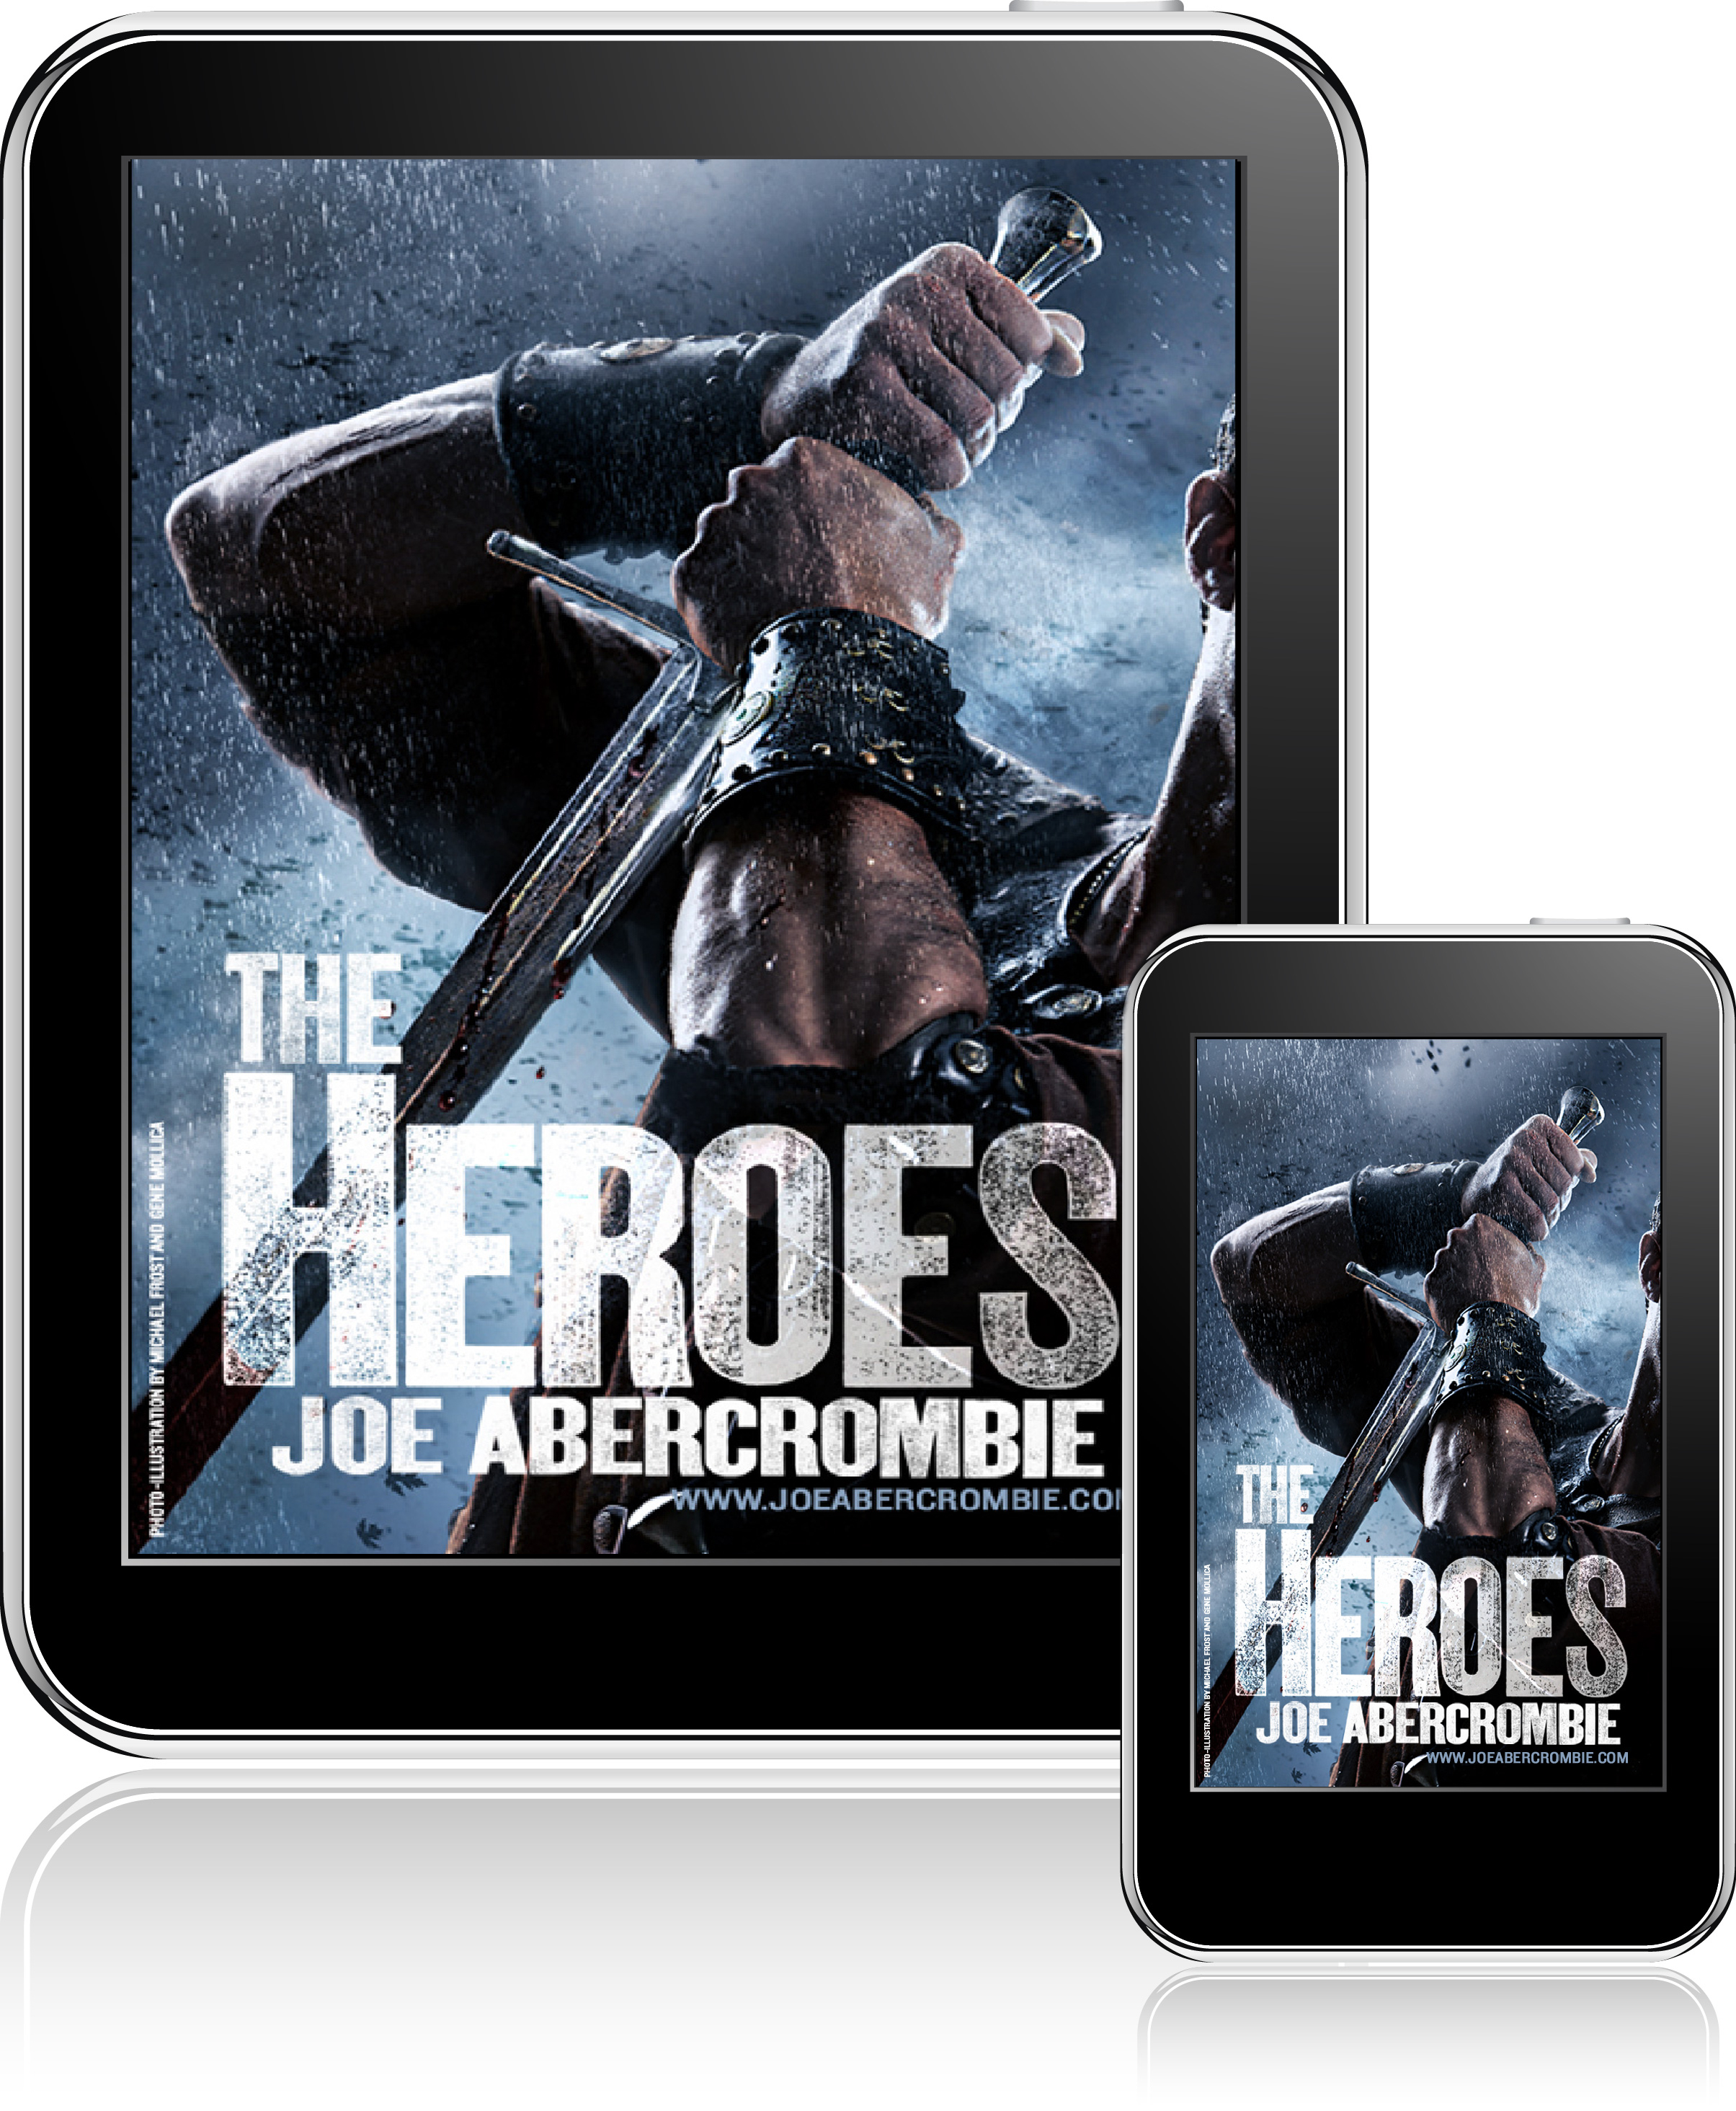 the heroes abercrombie joe